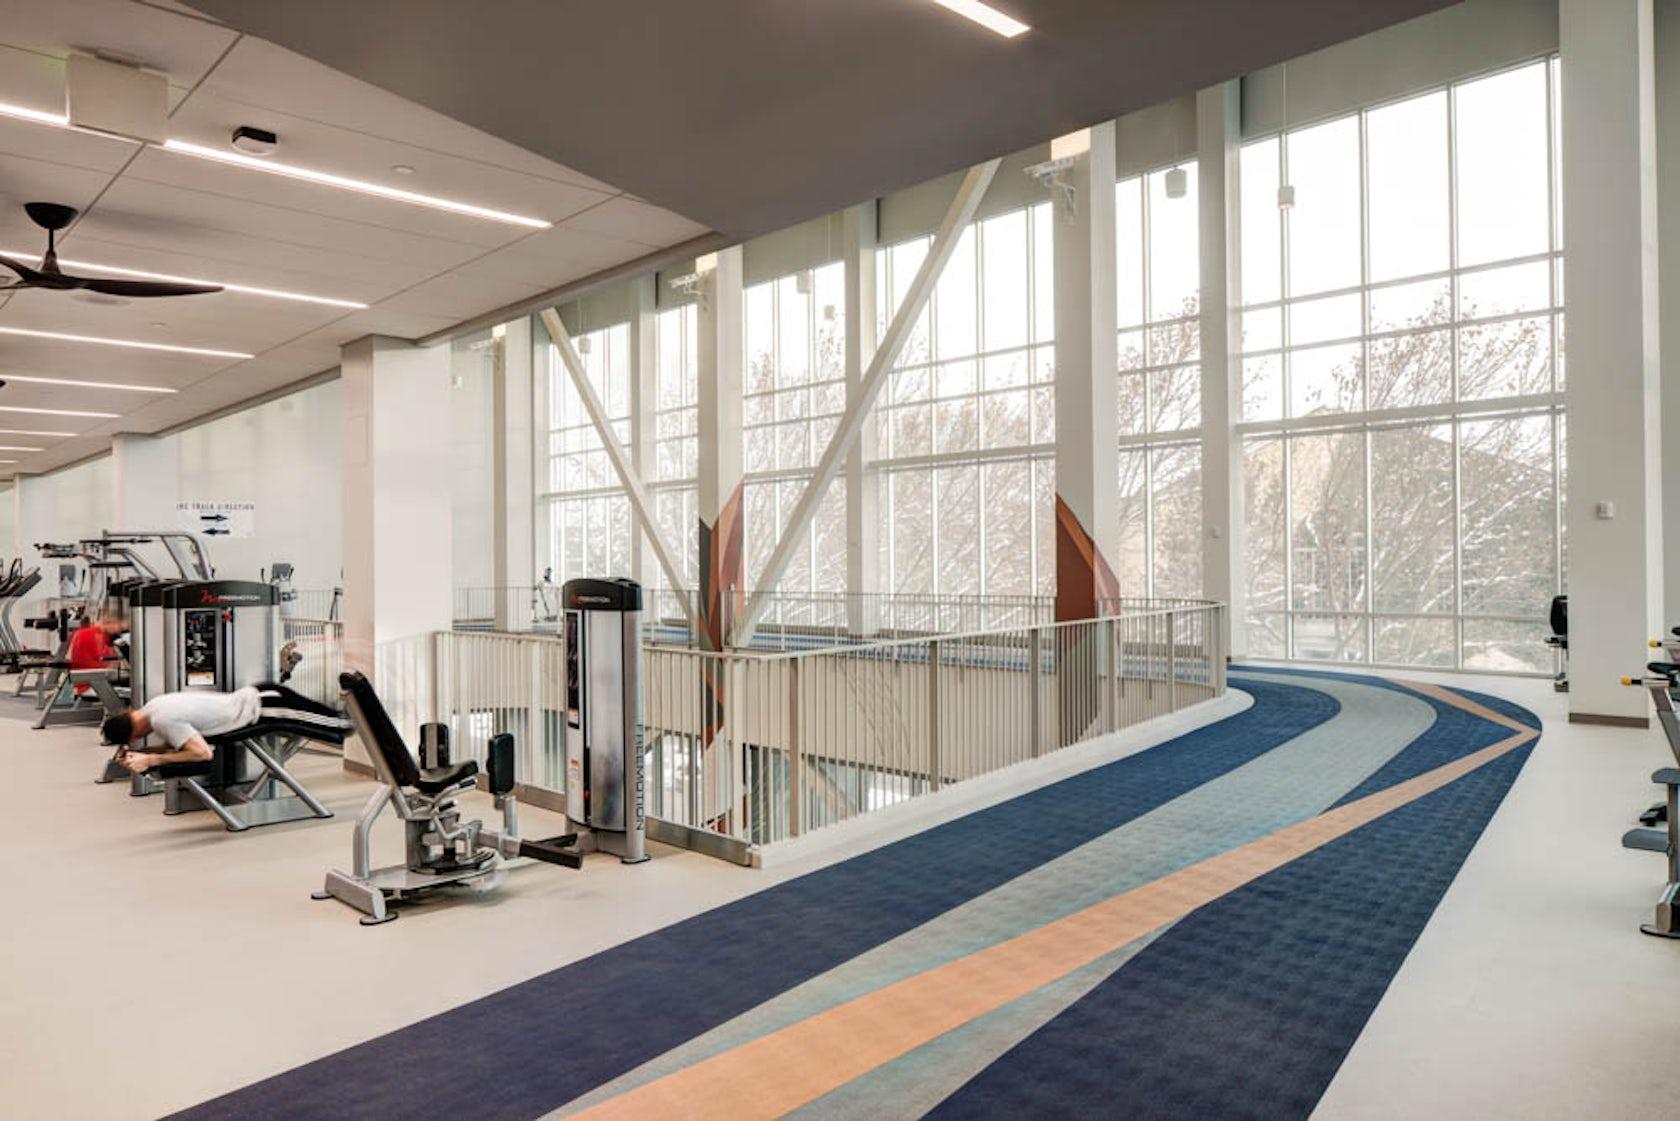 Utah State University Aggie Recreation Center (ARC) on